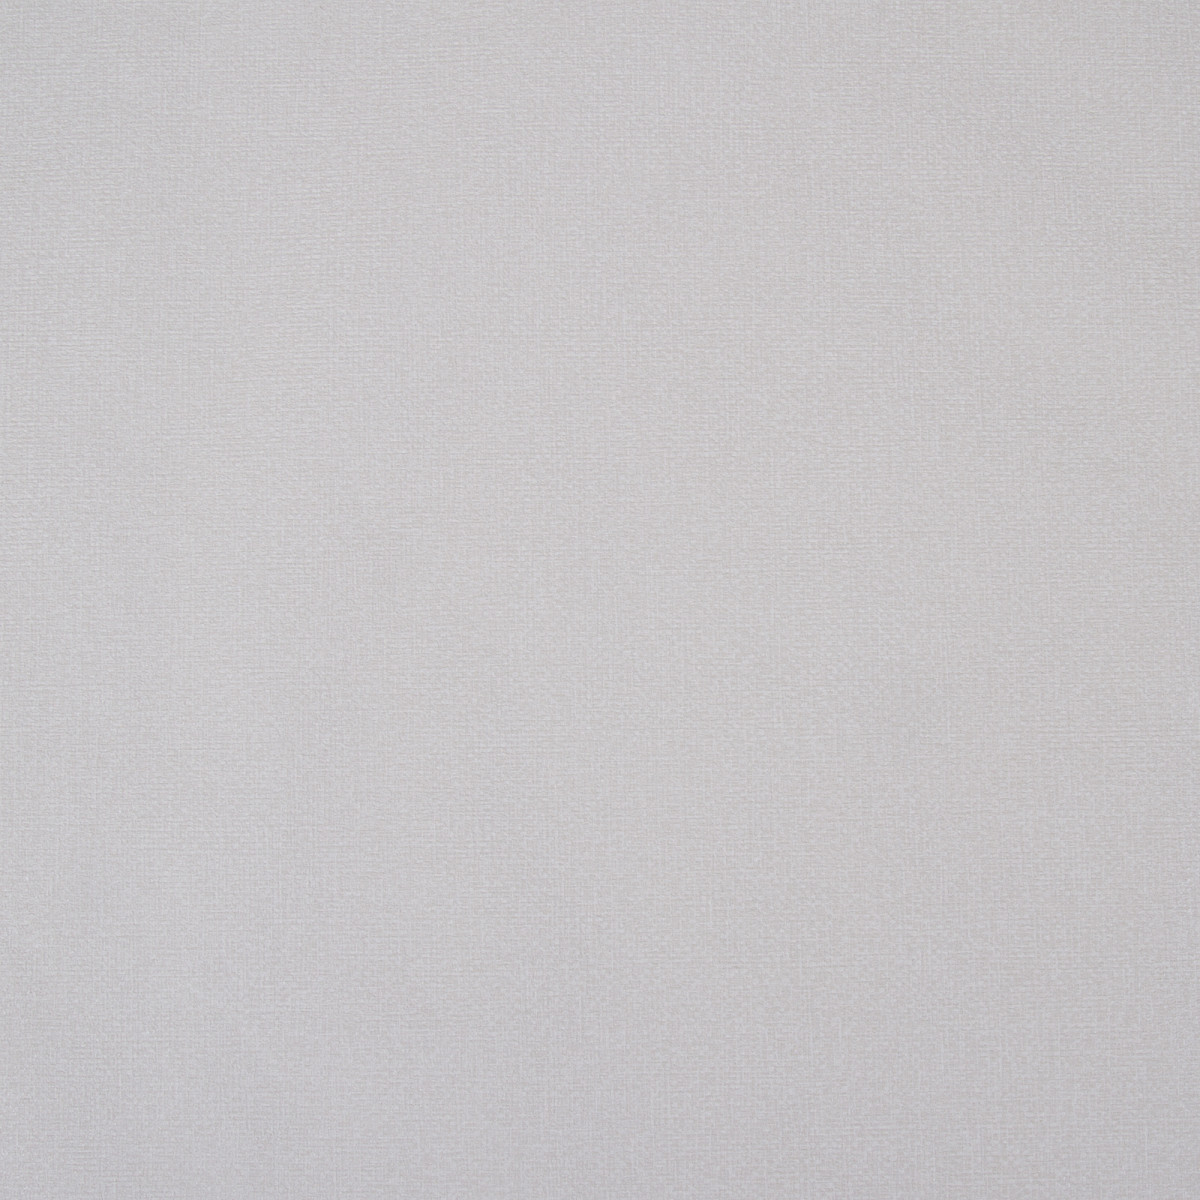 Обои на бумажной основе Лен 0.53х10 м фон серый Эл 31017